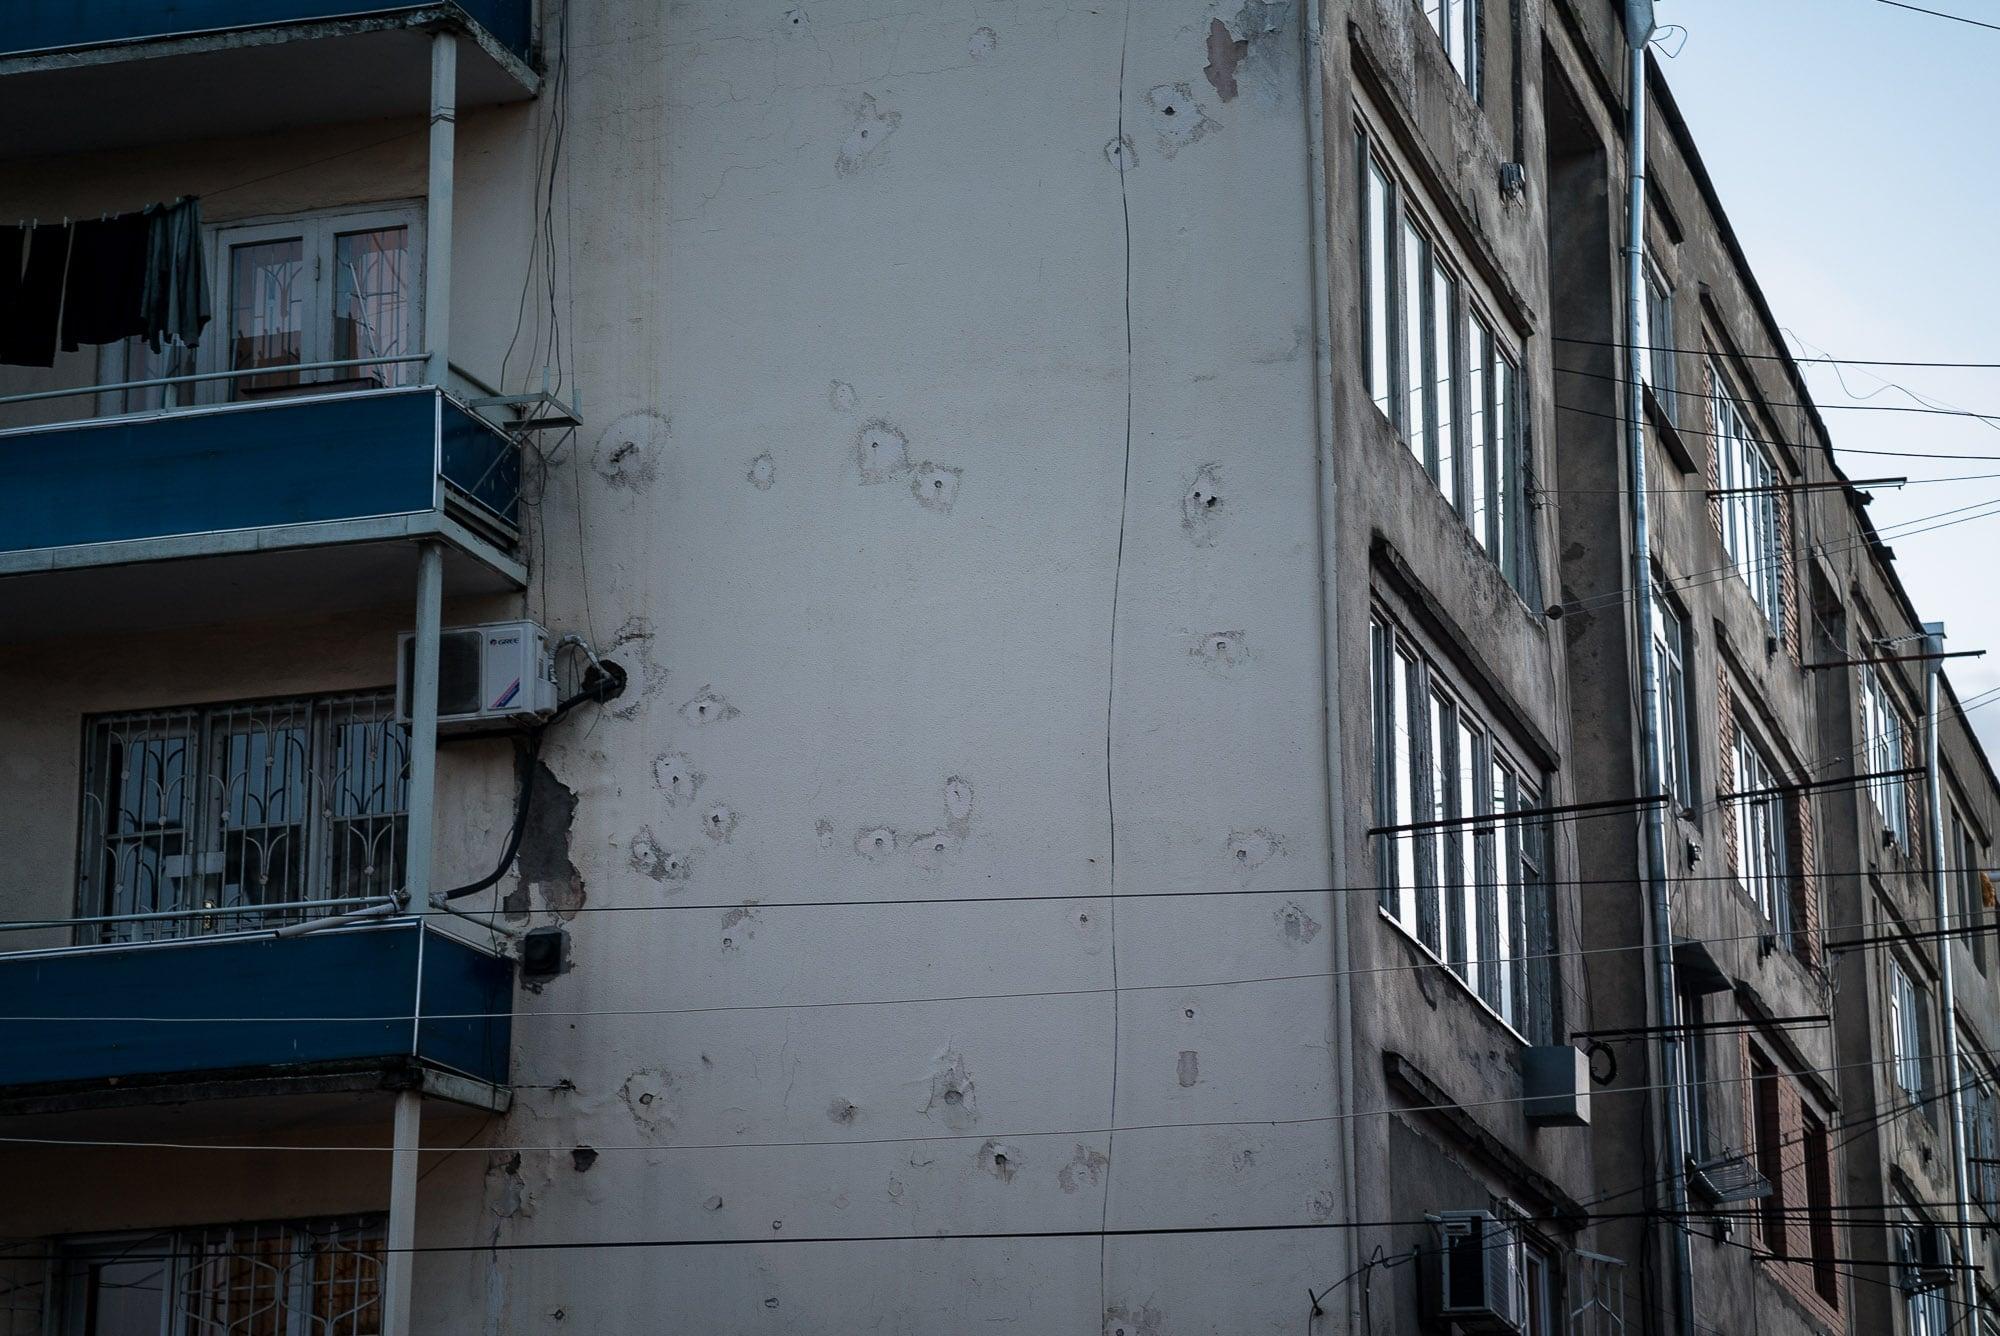 more bullet holes